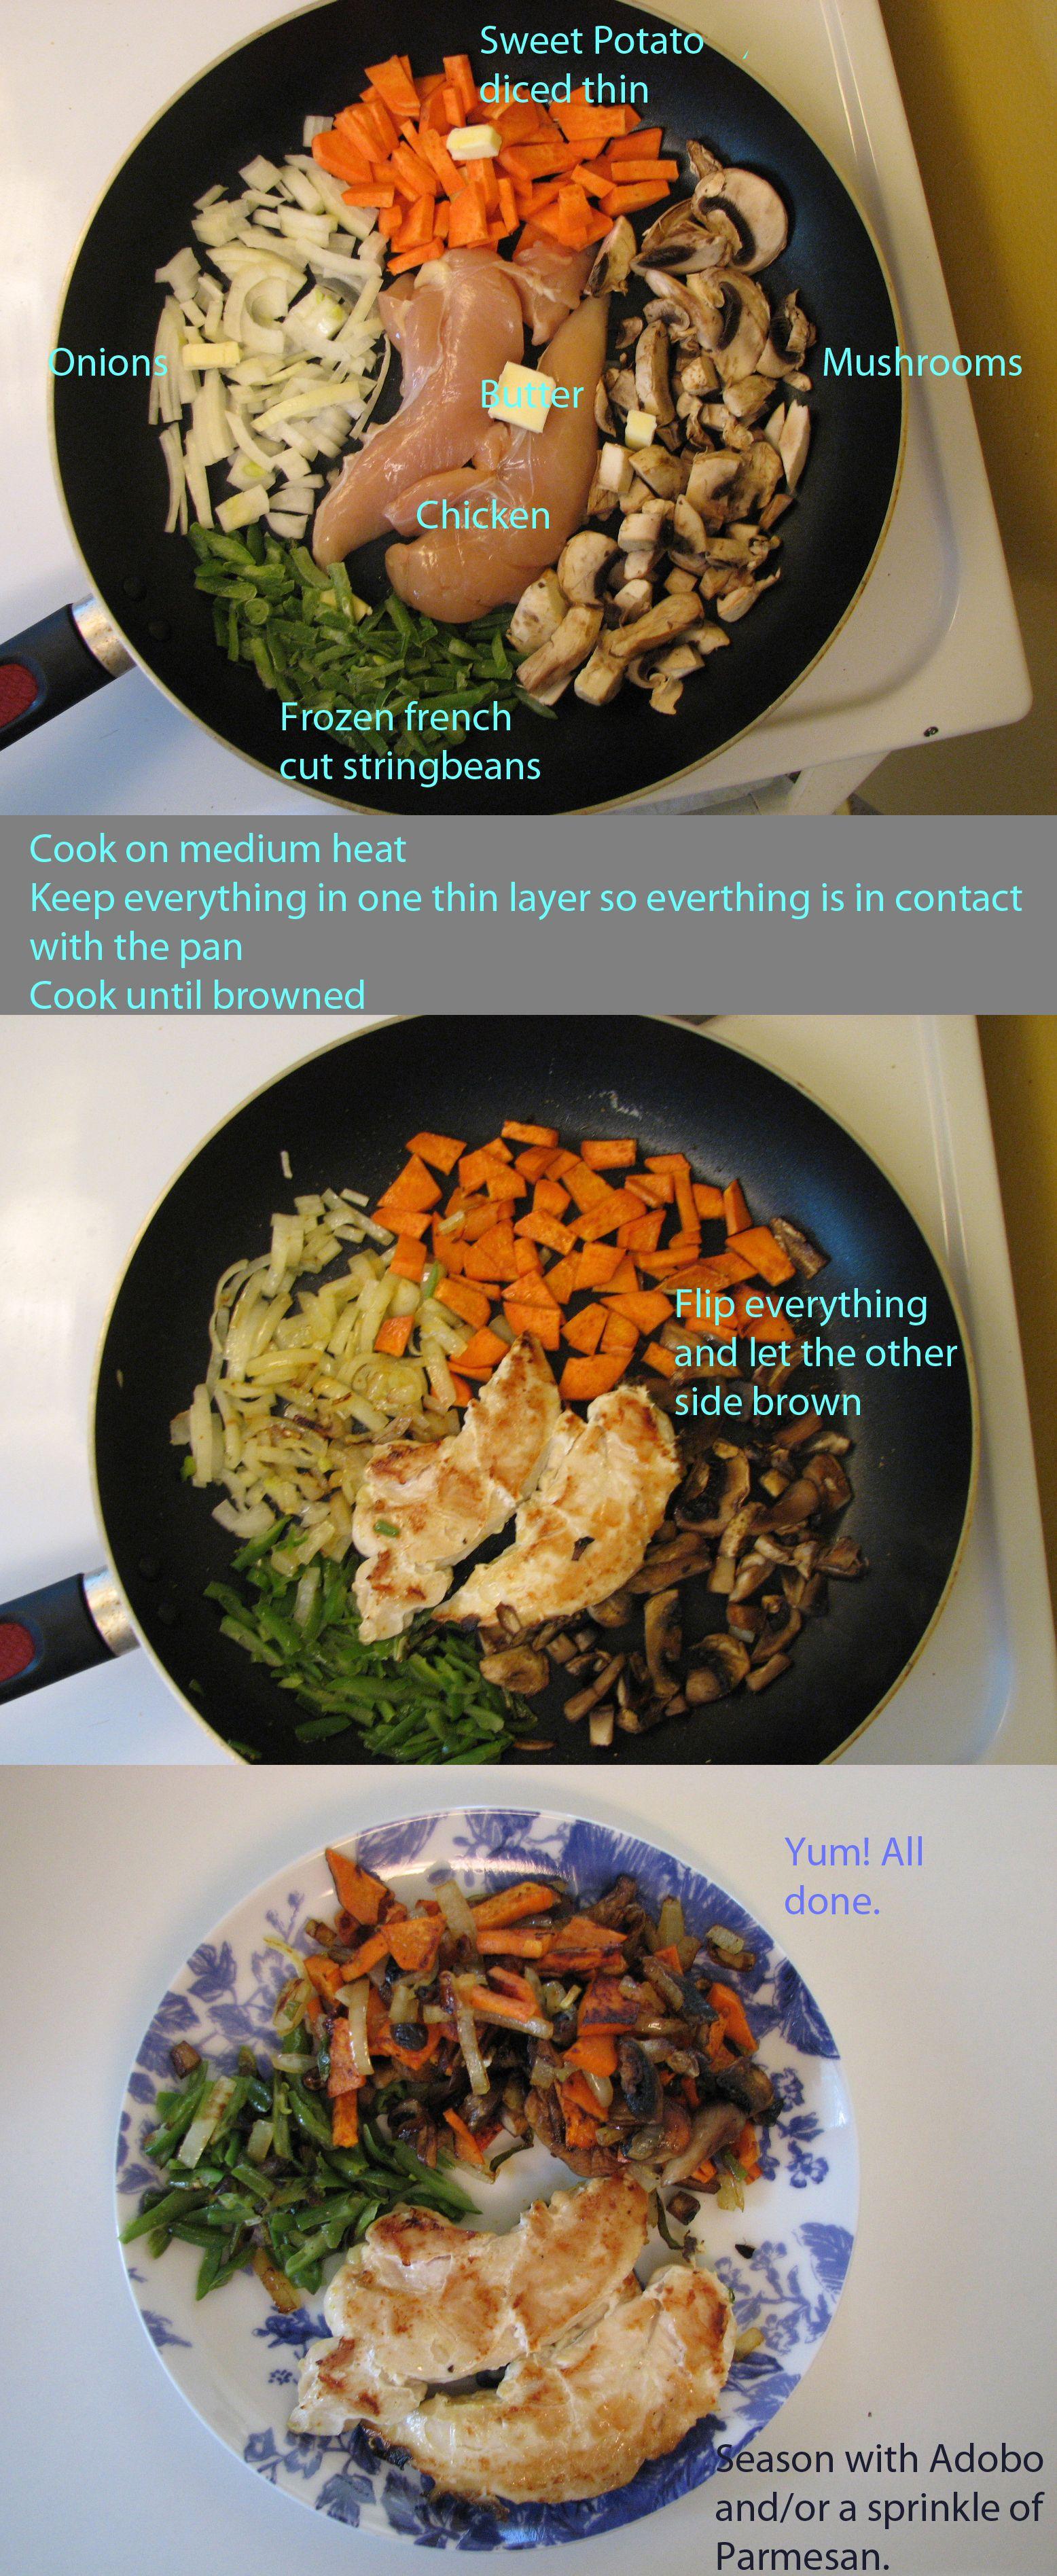 One Pan Dinner For One Person Skillet Dinner Healthy Dinner